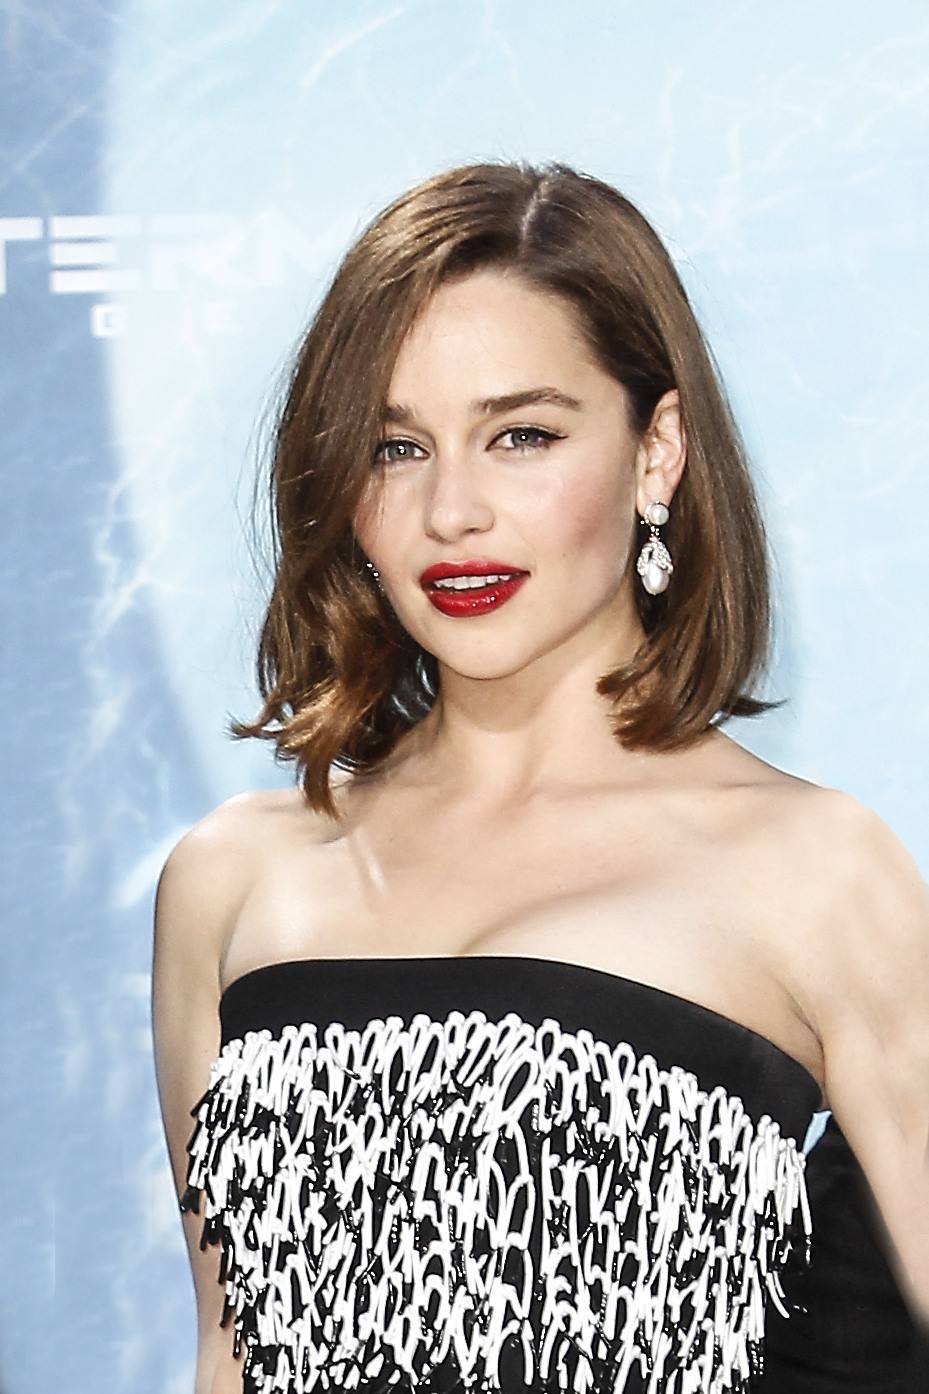 Emilia Clarke (born 1986)